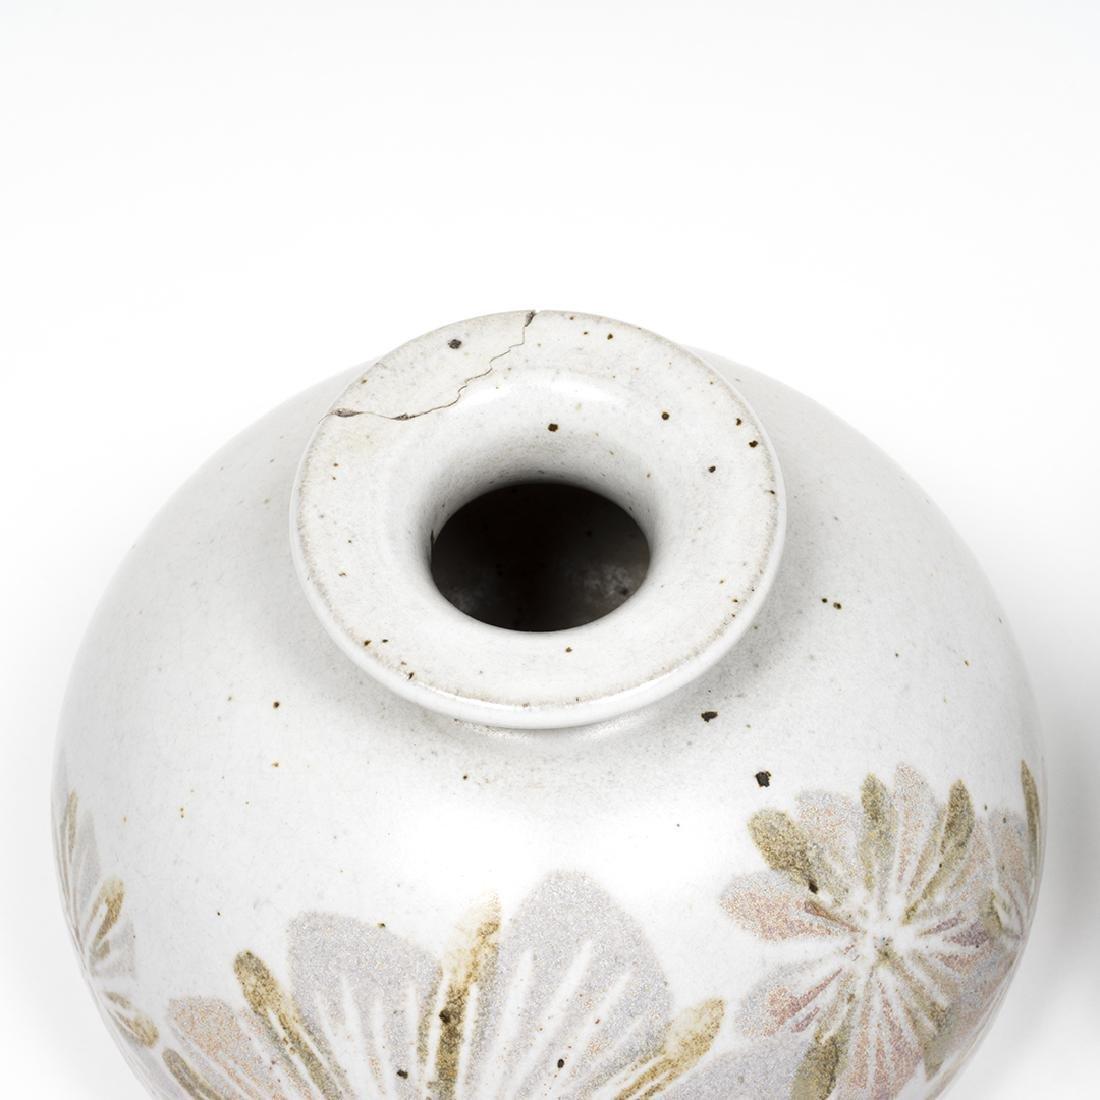 Robert Maxwell Vases (2) - 3